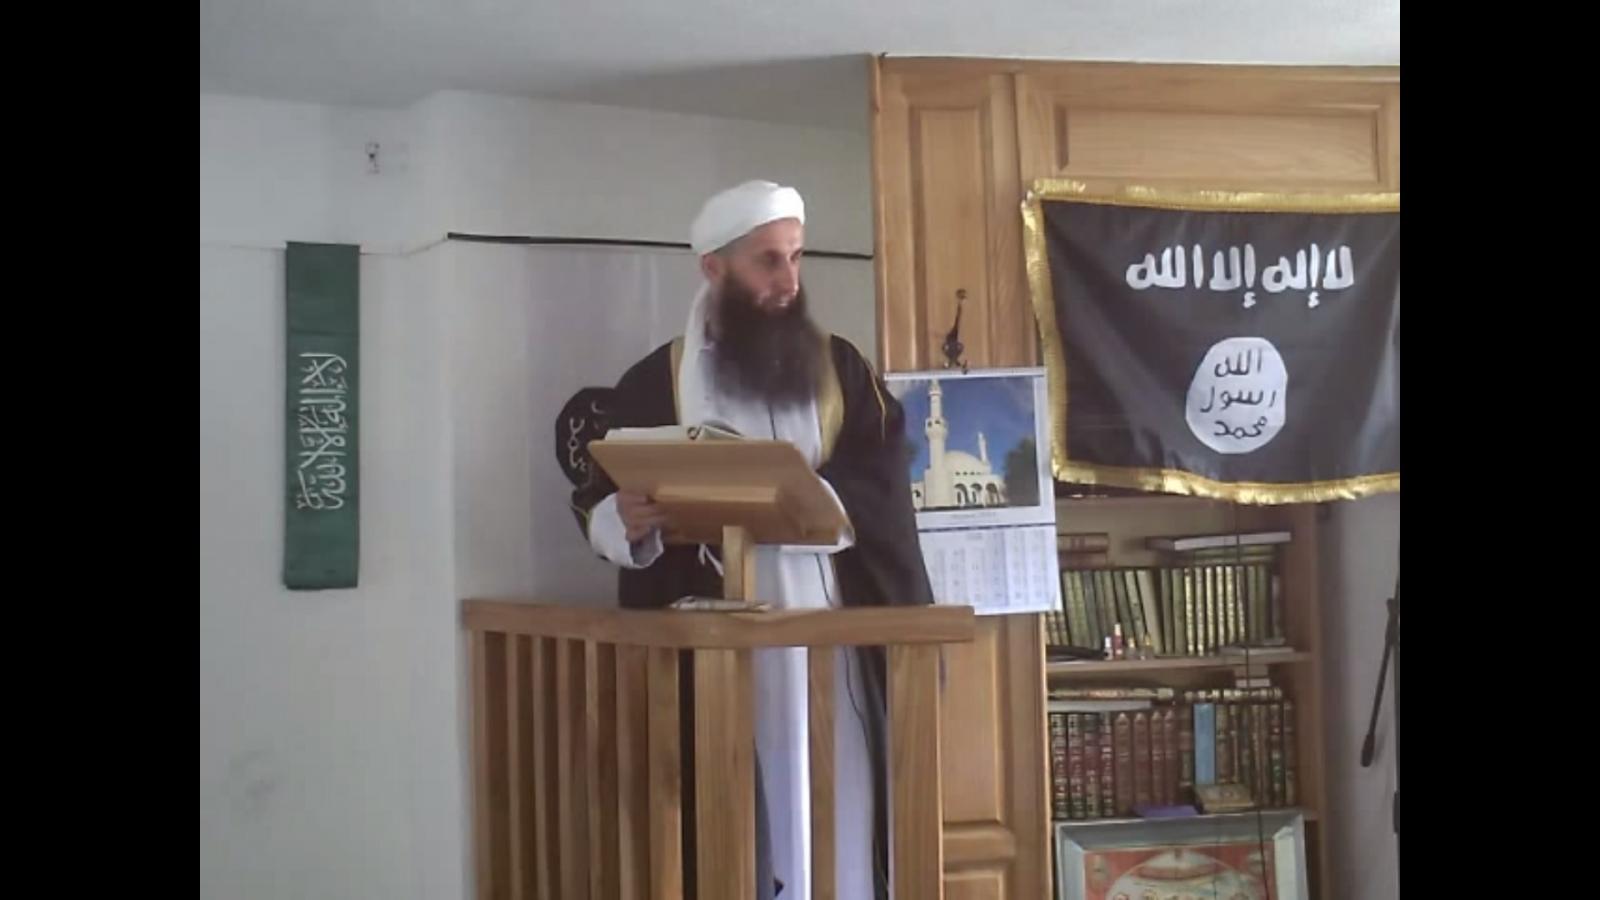 Bilal Bosnic